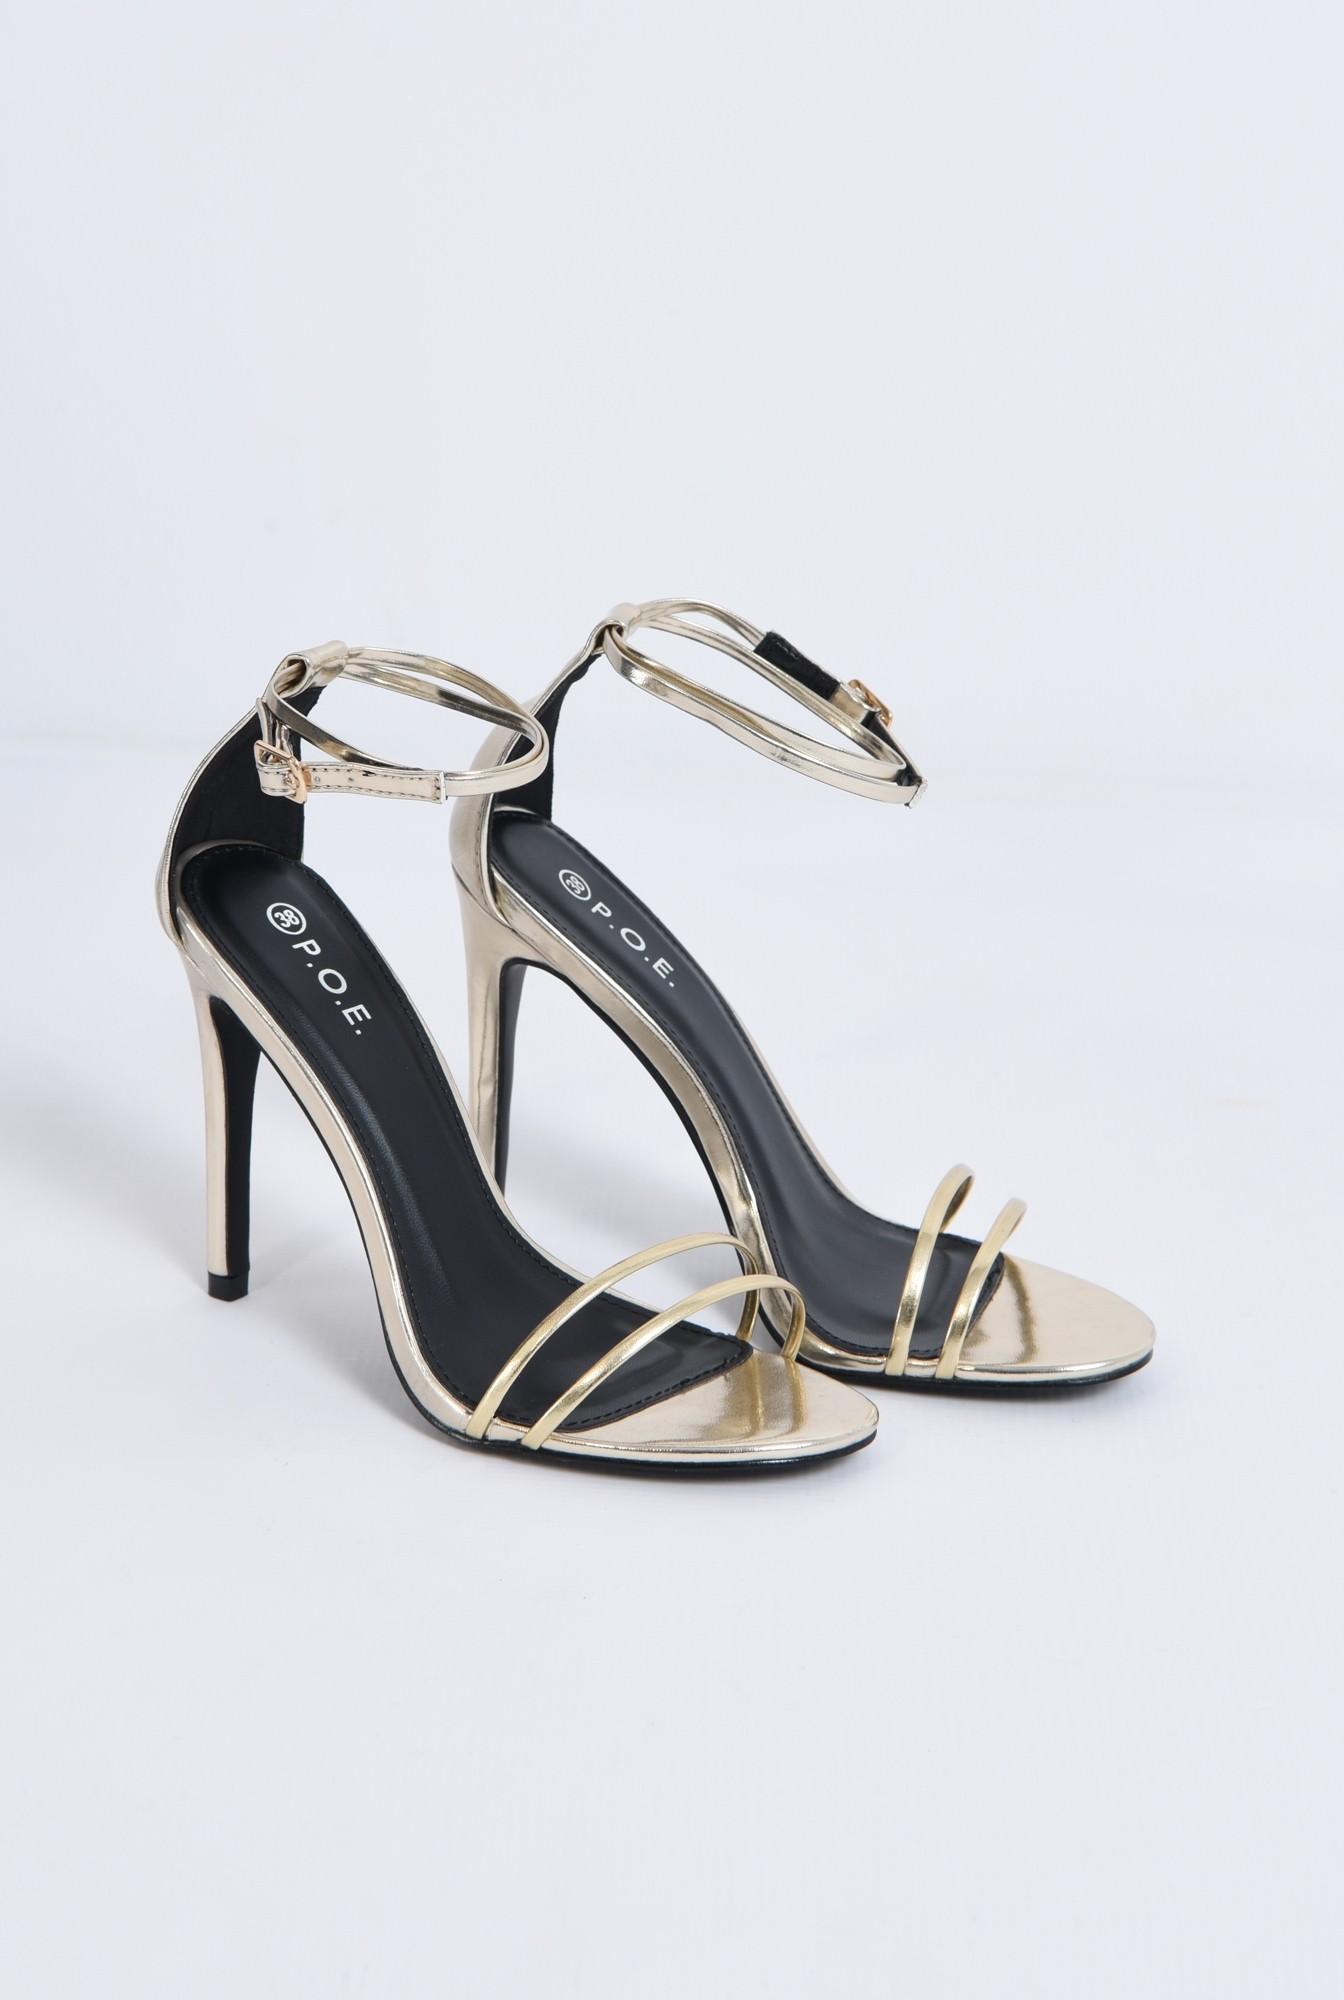 2 - sandale elegante, aurii, stiletto